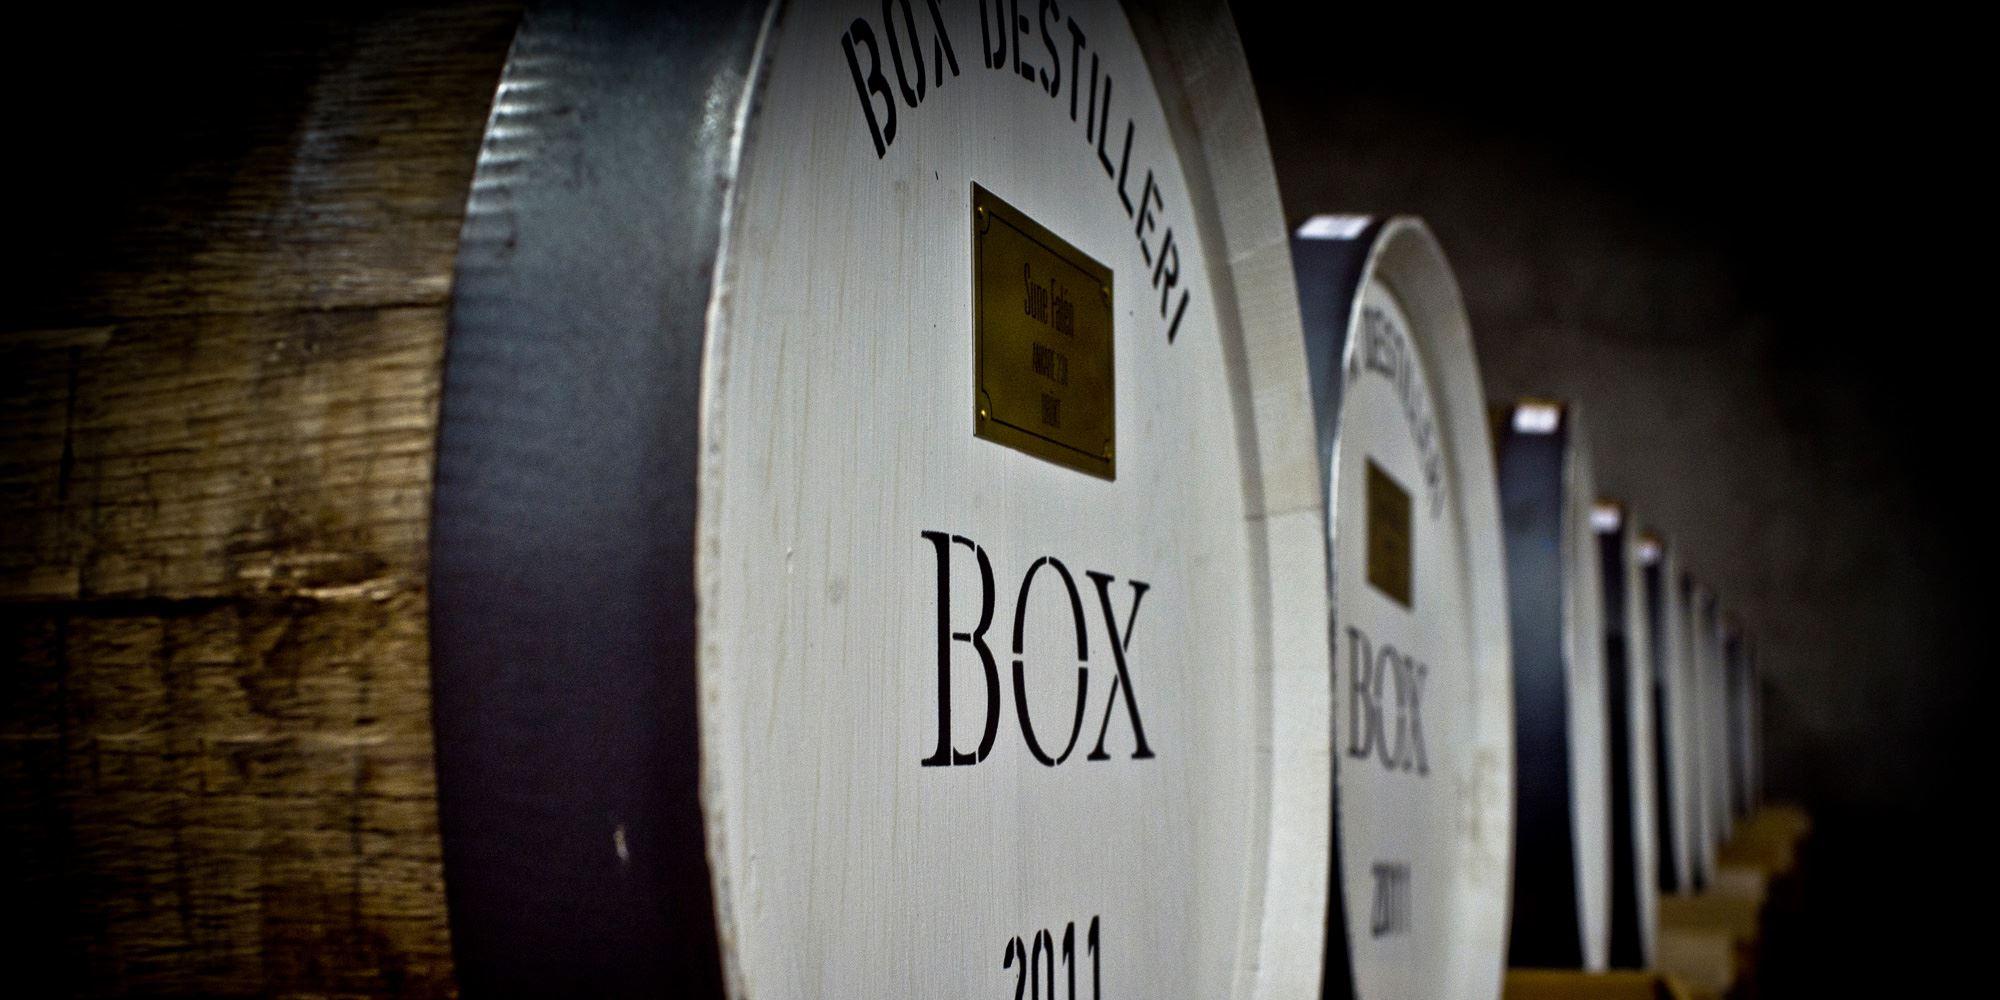 Trip to Ådalen and Box Distillery Monday 23/7